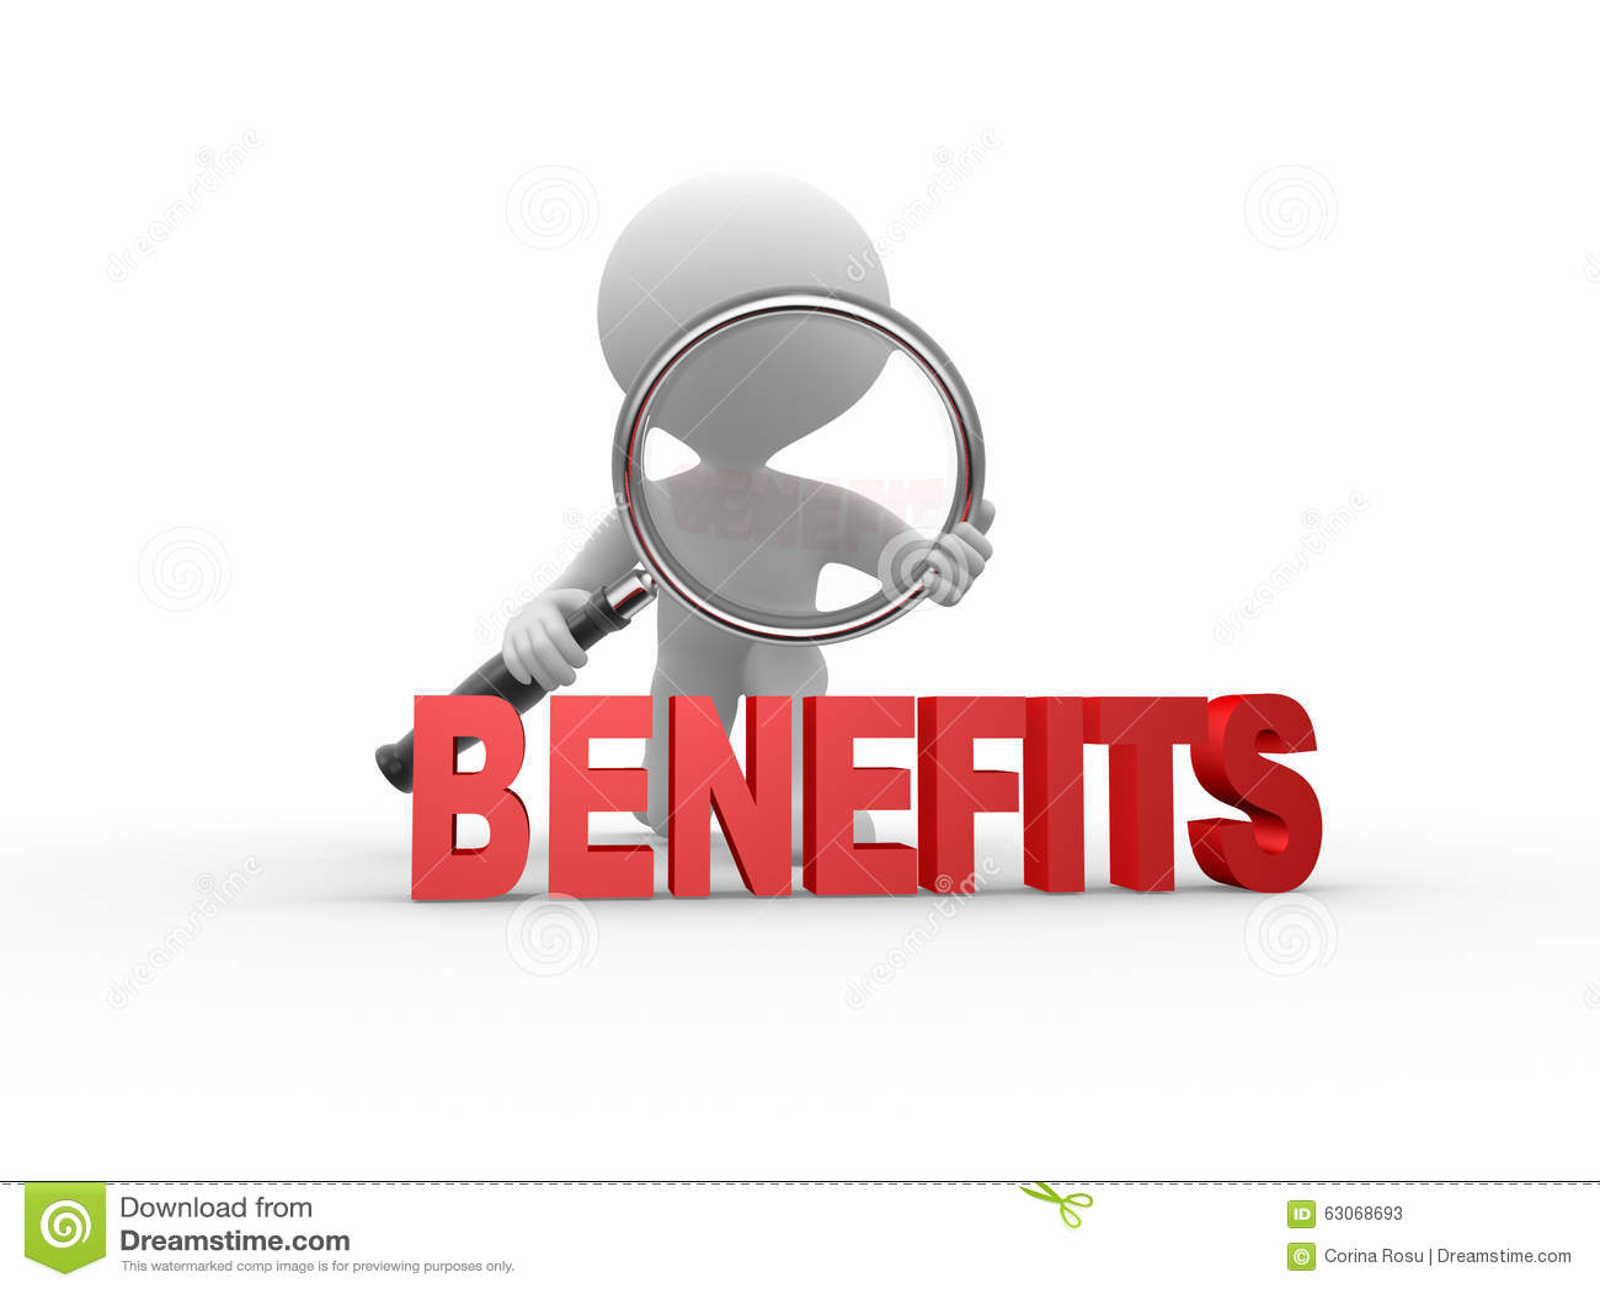 Benefits Stock Illustration Image 63068693